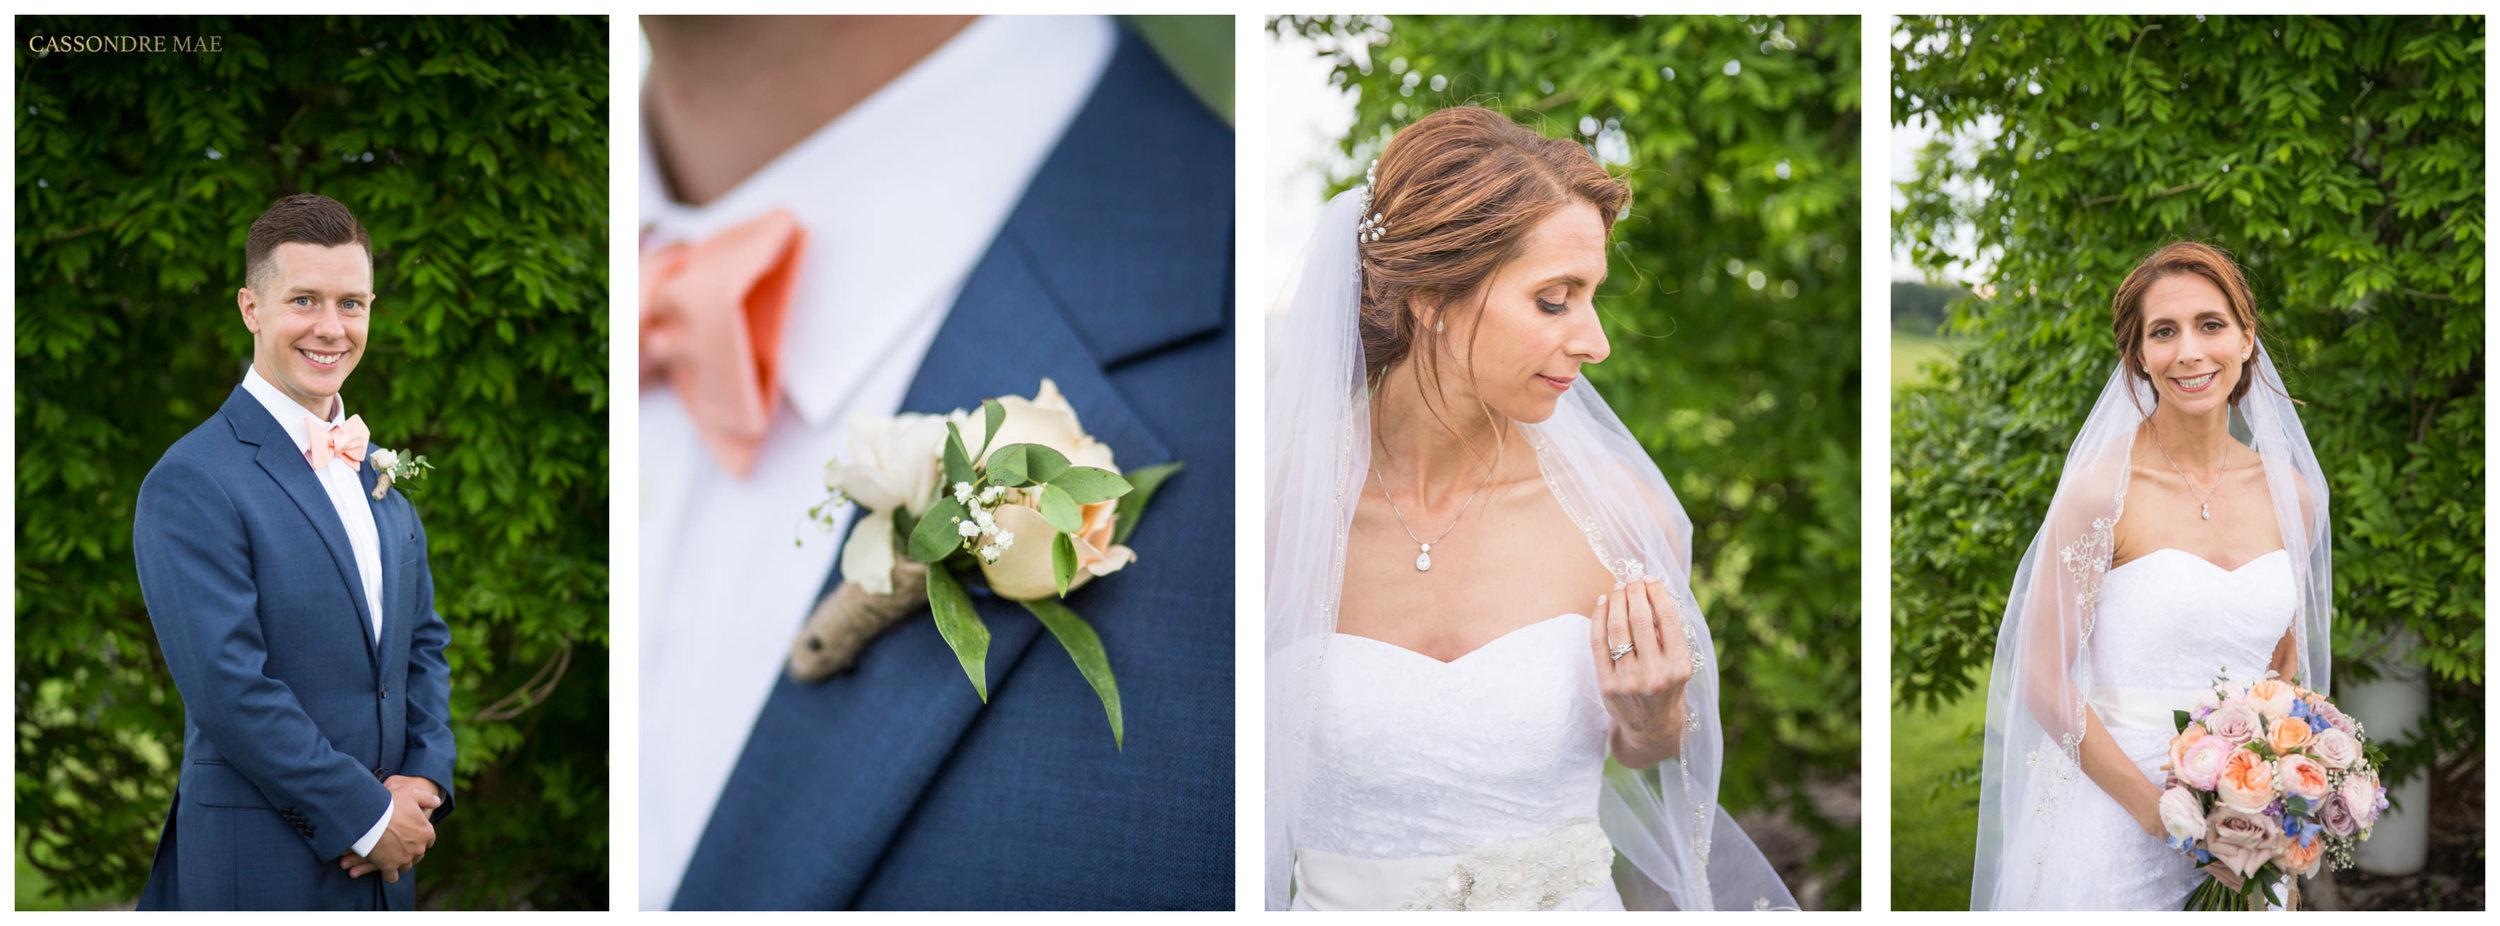 Cassondre Mae Photography Links at Unionvale Wedding 13.jpg